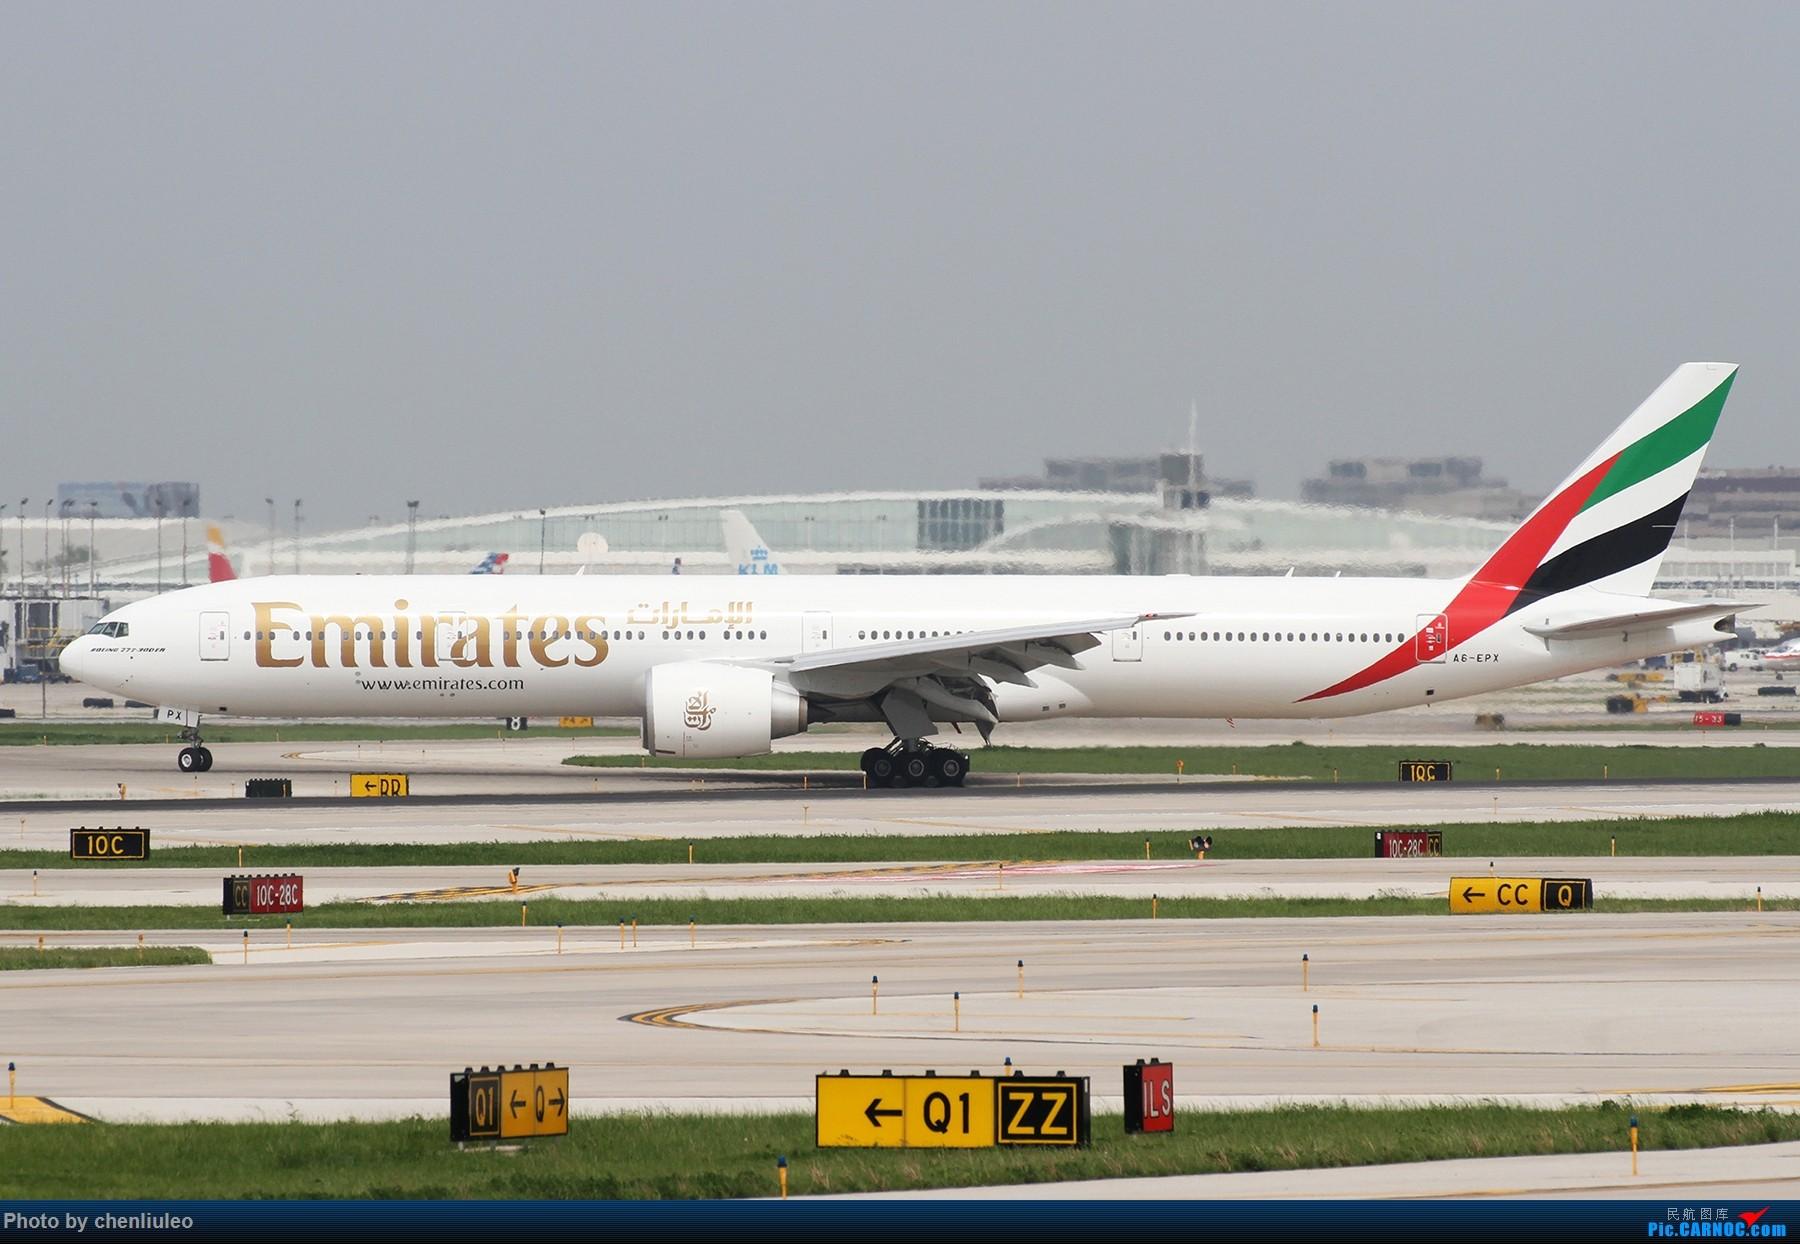 Re:[原创]【北美飞友会】芝加哥奥黑尔机场首拍 BOEING 777-300ER A6-EPX 美国芝加哥奥黑尔国际机场